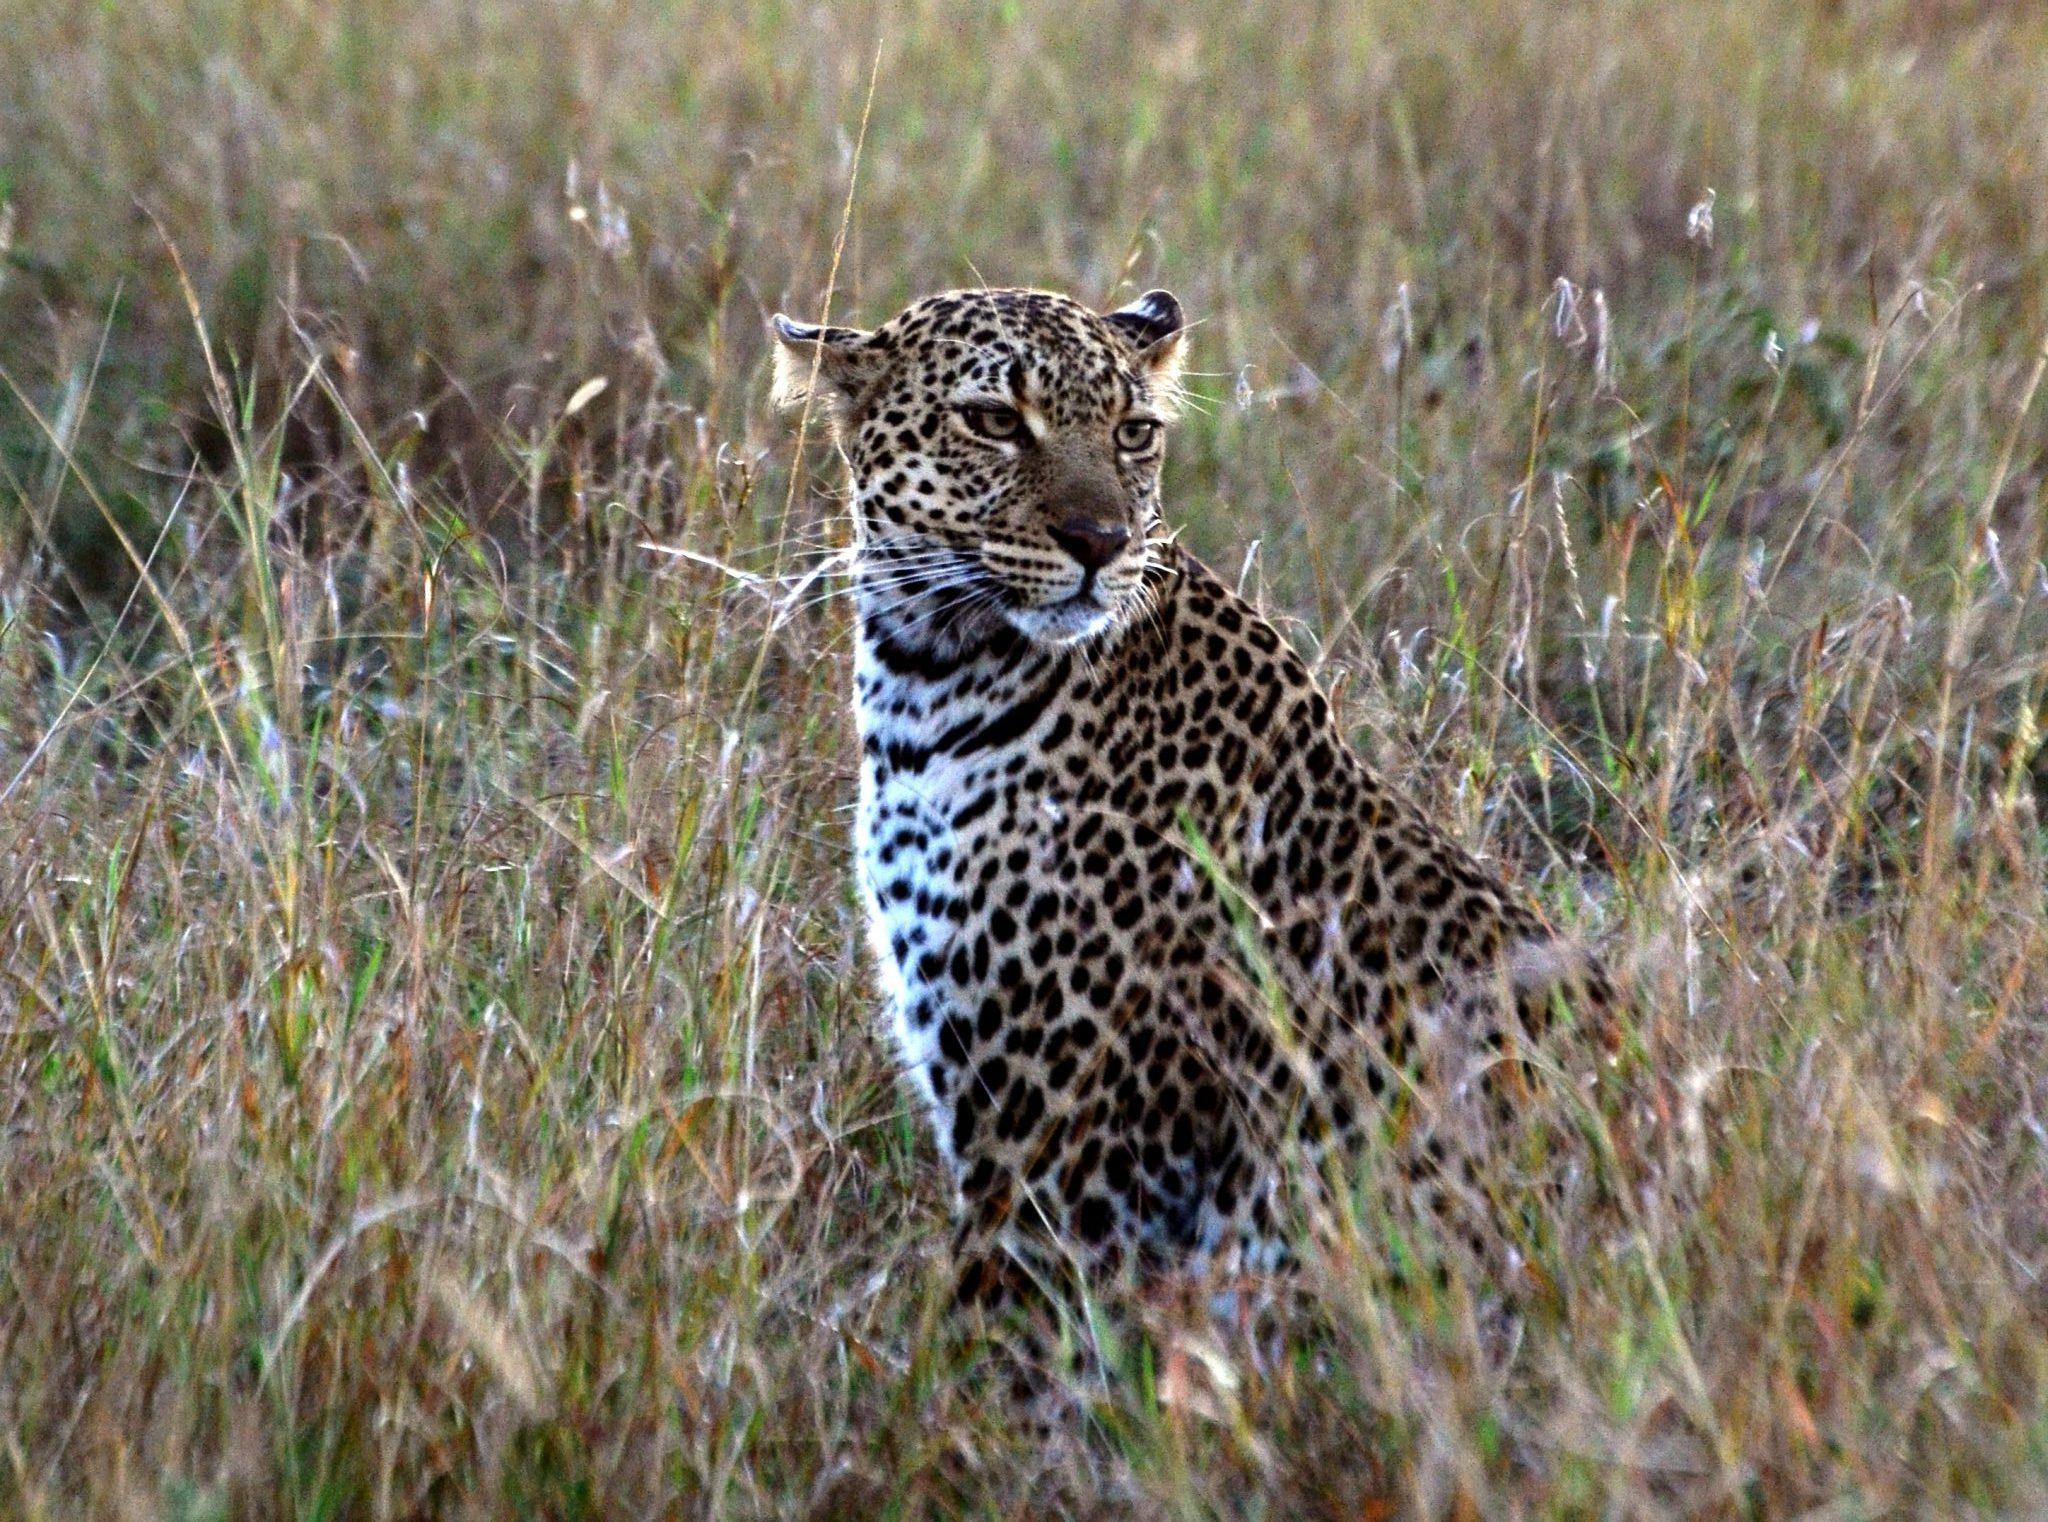 Leopard in der Masai Mara in Kenia - auf Kenia Safari